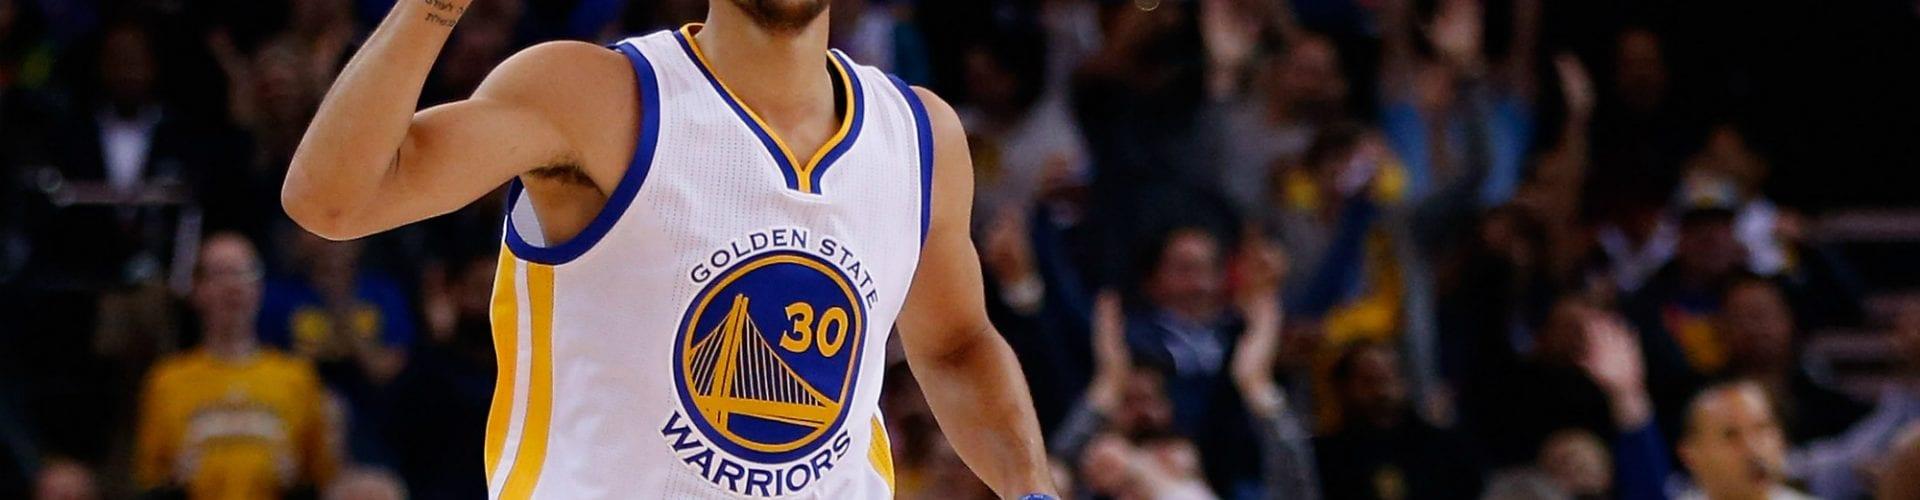 NBA Playoff Games Headline Wednesday Tickets On Sale